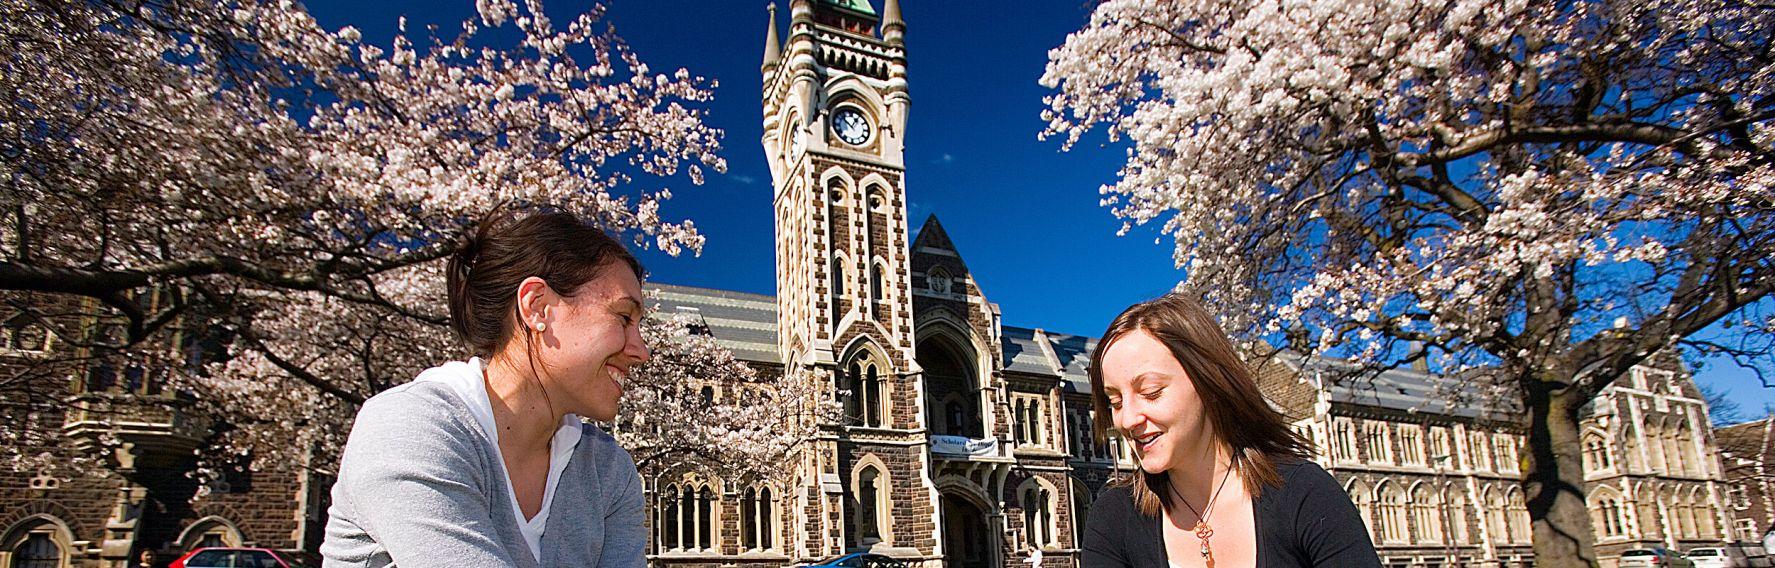 University of Otago Clocktower & Students on the Clocktower lawn